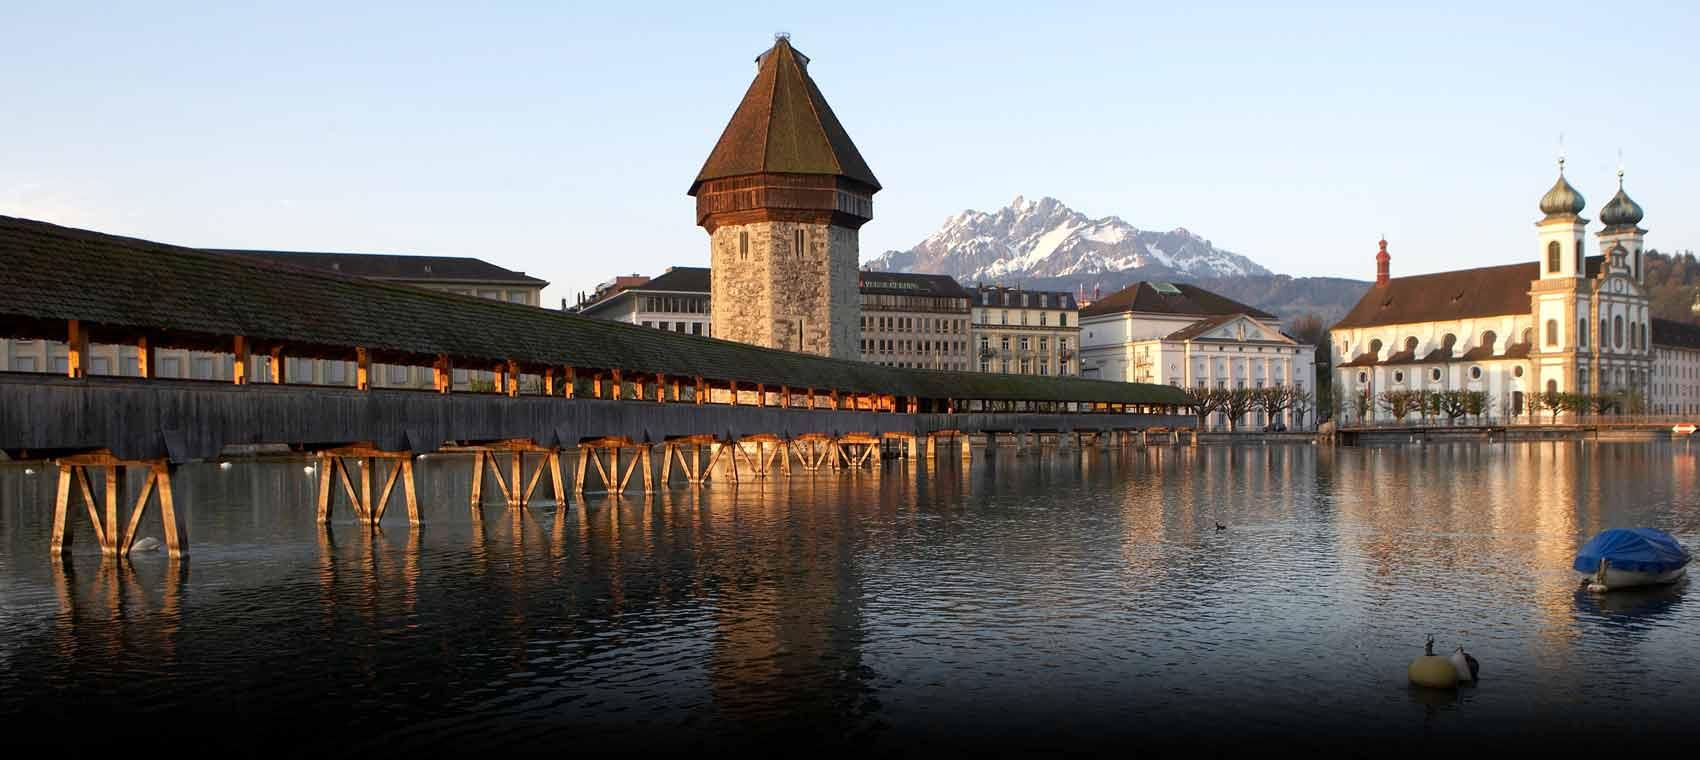 Chapel Bridge, Lucerne, Switzerland  № 1473303  скачать